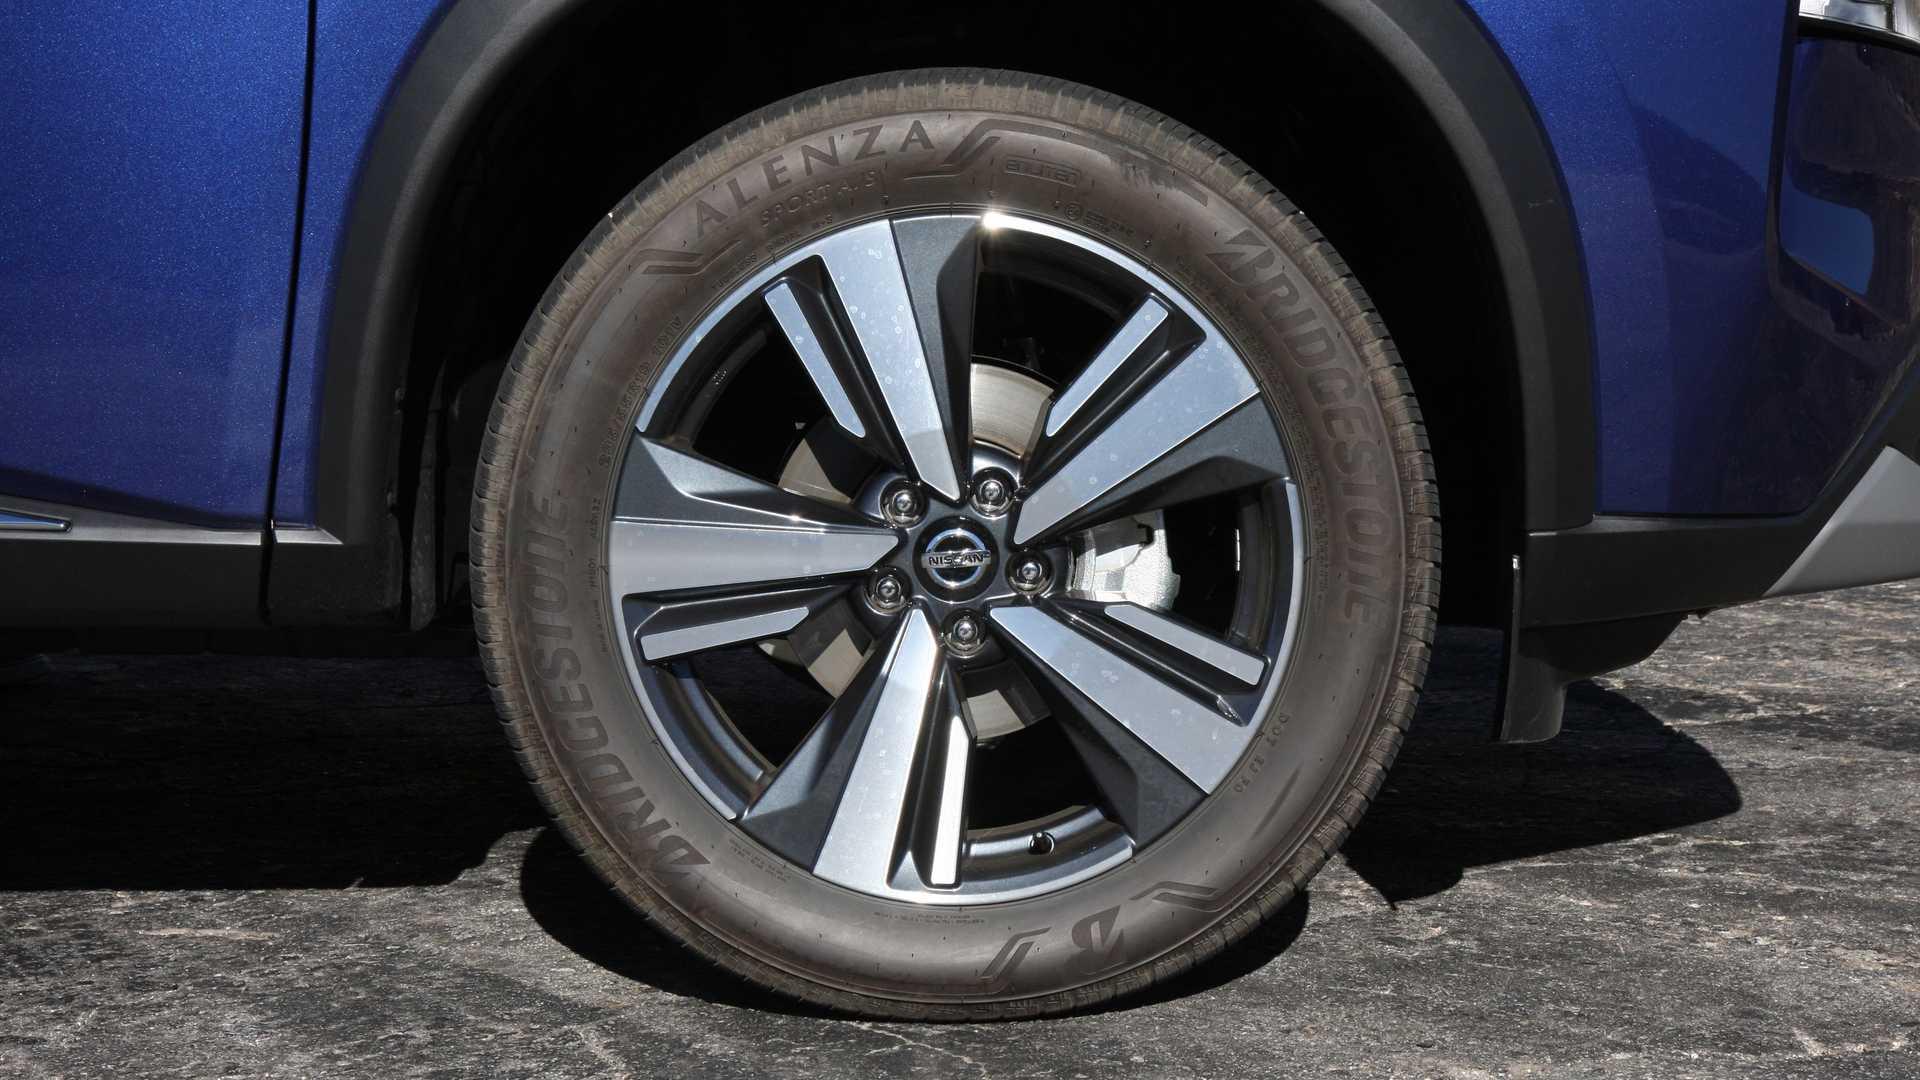 2021 nissan rogue sl exterior wheel